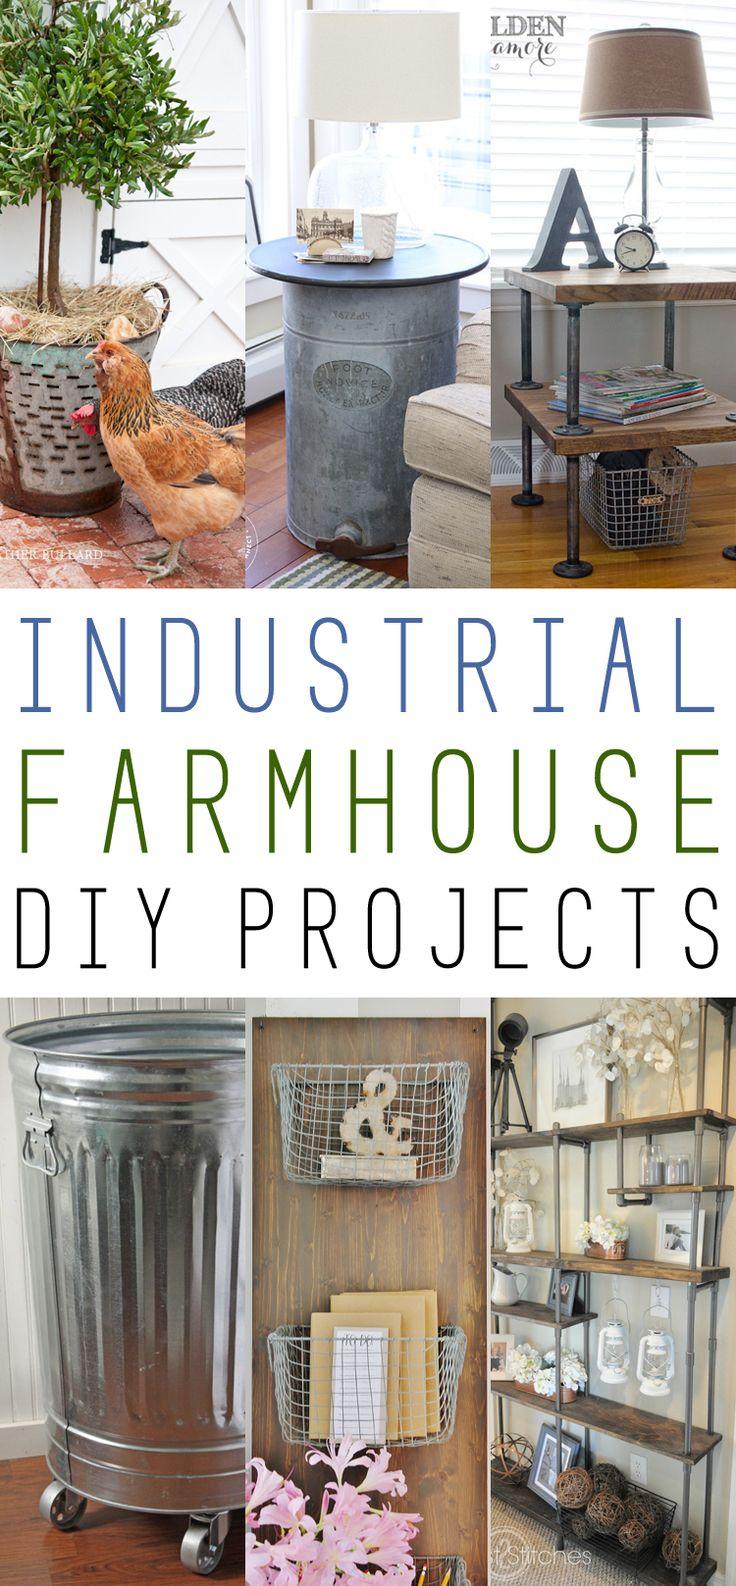 Farmhouse Fridays /// Industrial Farmhouse DIY Projects - The Cottage Market